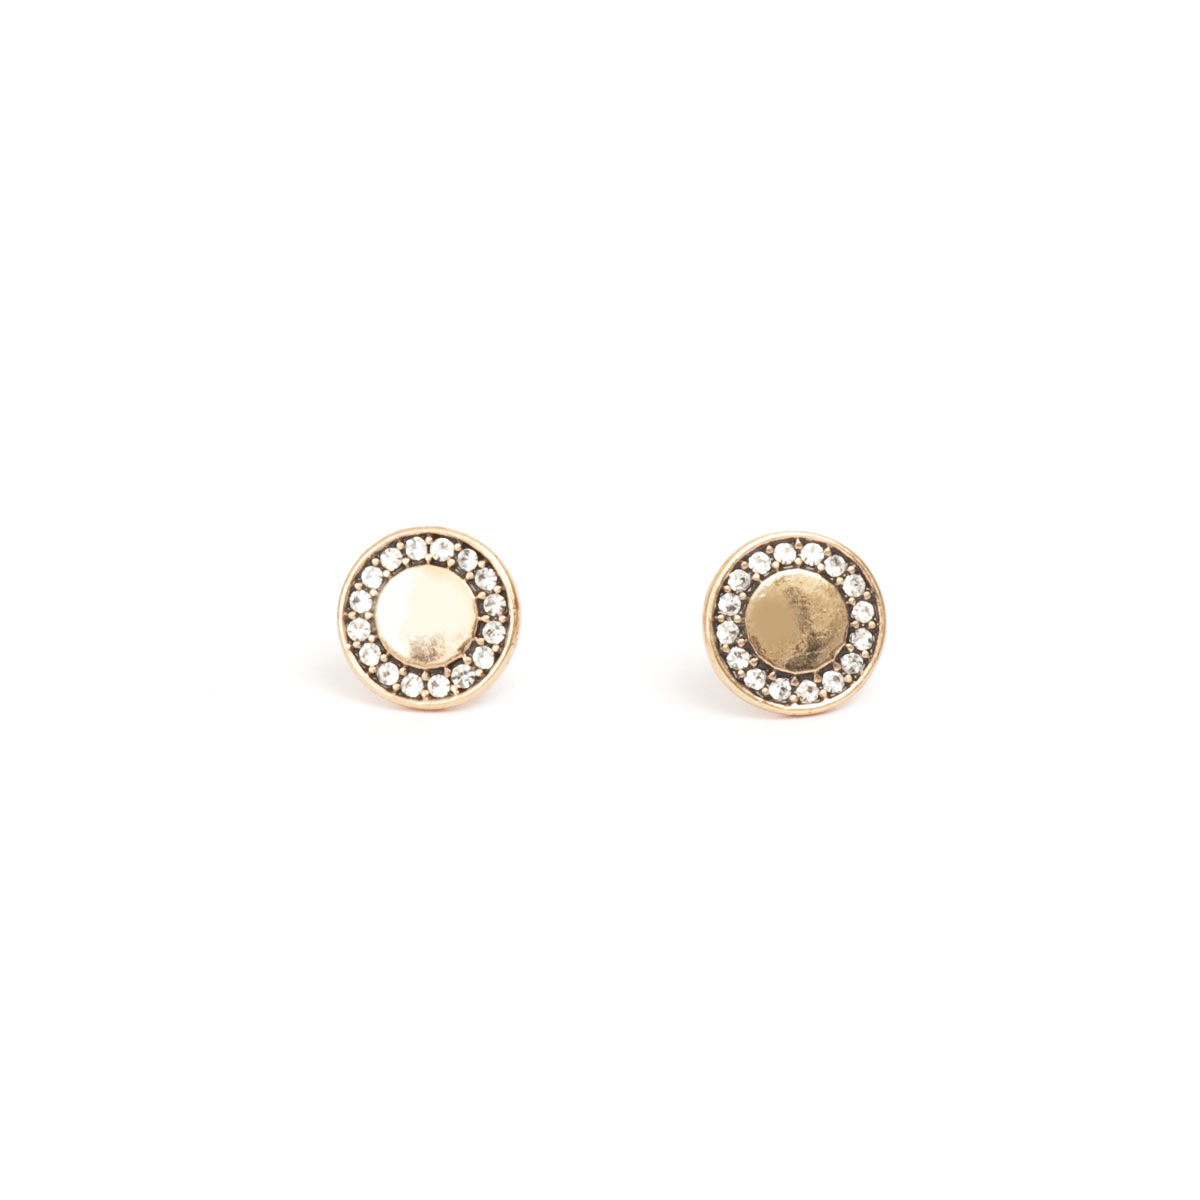 Серьги(1018-0590)Shiny Plated Basics<br>Размер вставки 10 мм<br>